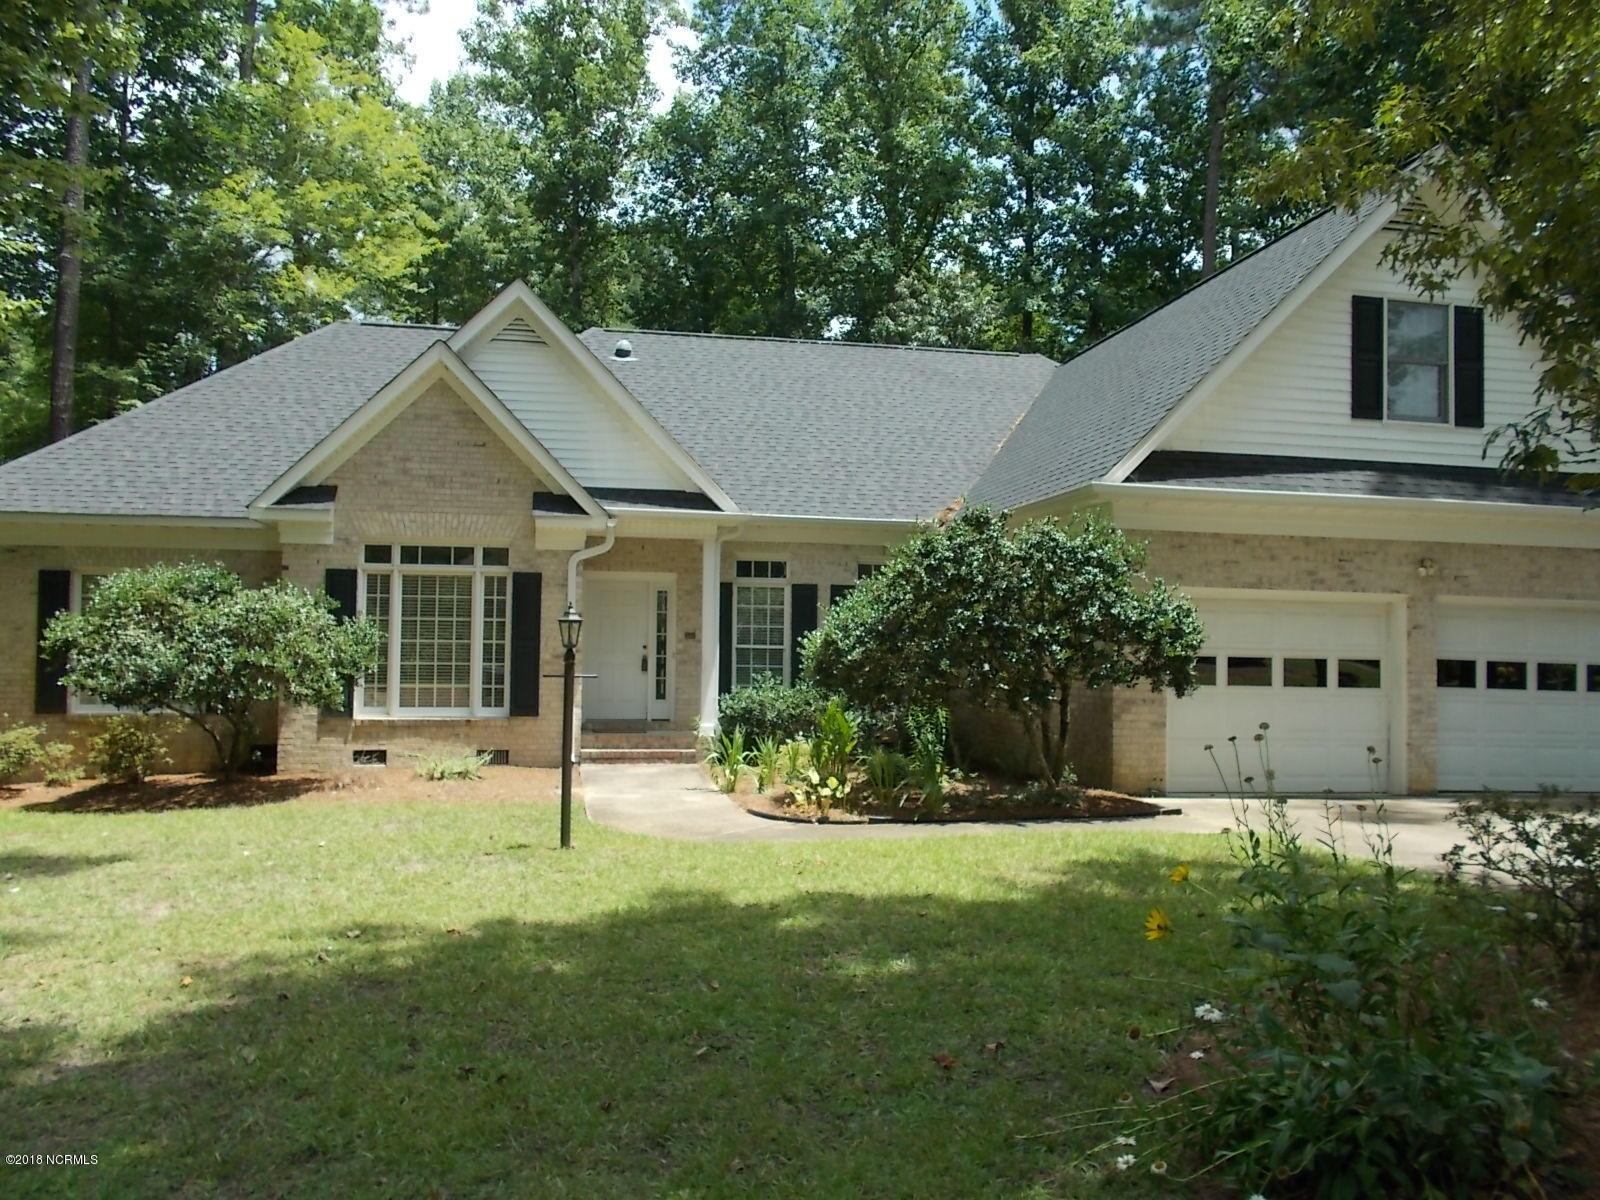 101 James Court, Chocowinity, North Carolina, 3 Bedrooms Bedrooms, 9 Rooms Rooms,2 BathroomsBathrooms,Single family residence,For sale,James,100124311